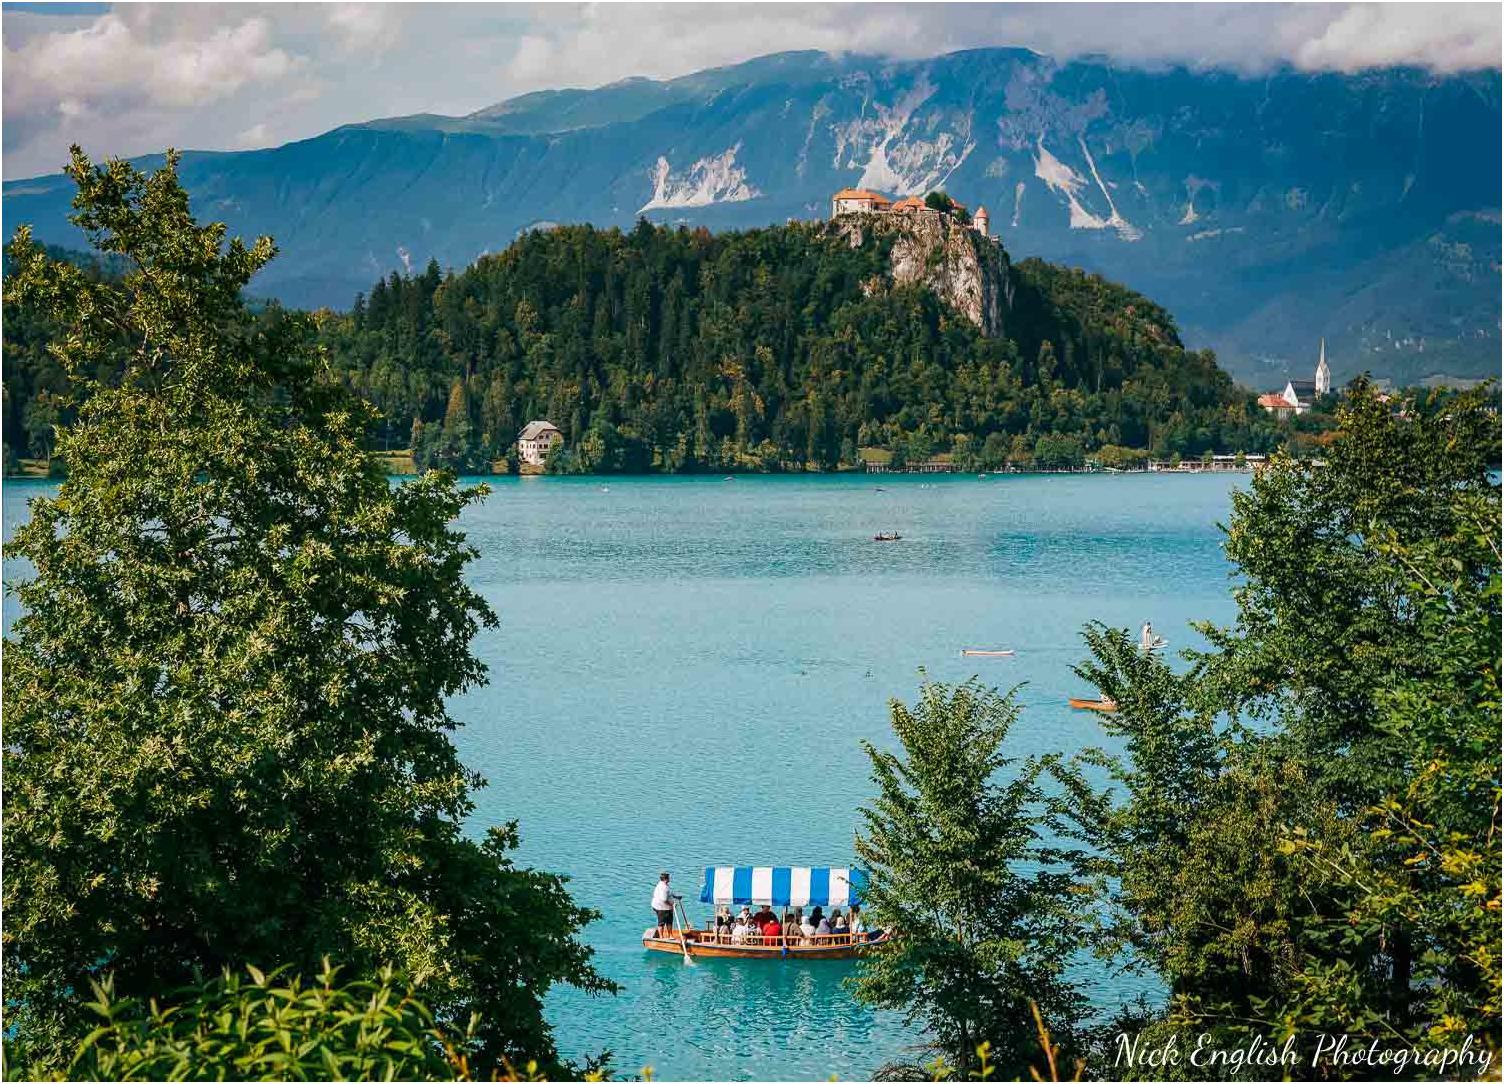 Destination_Wedding_Photographer_Slovenia_Nick_English_Photography-26.jpg